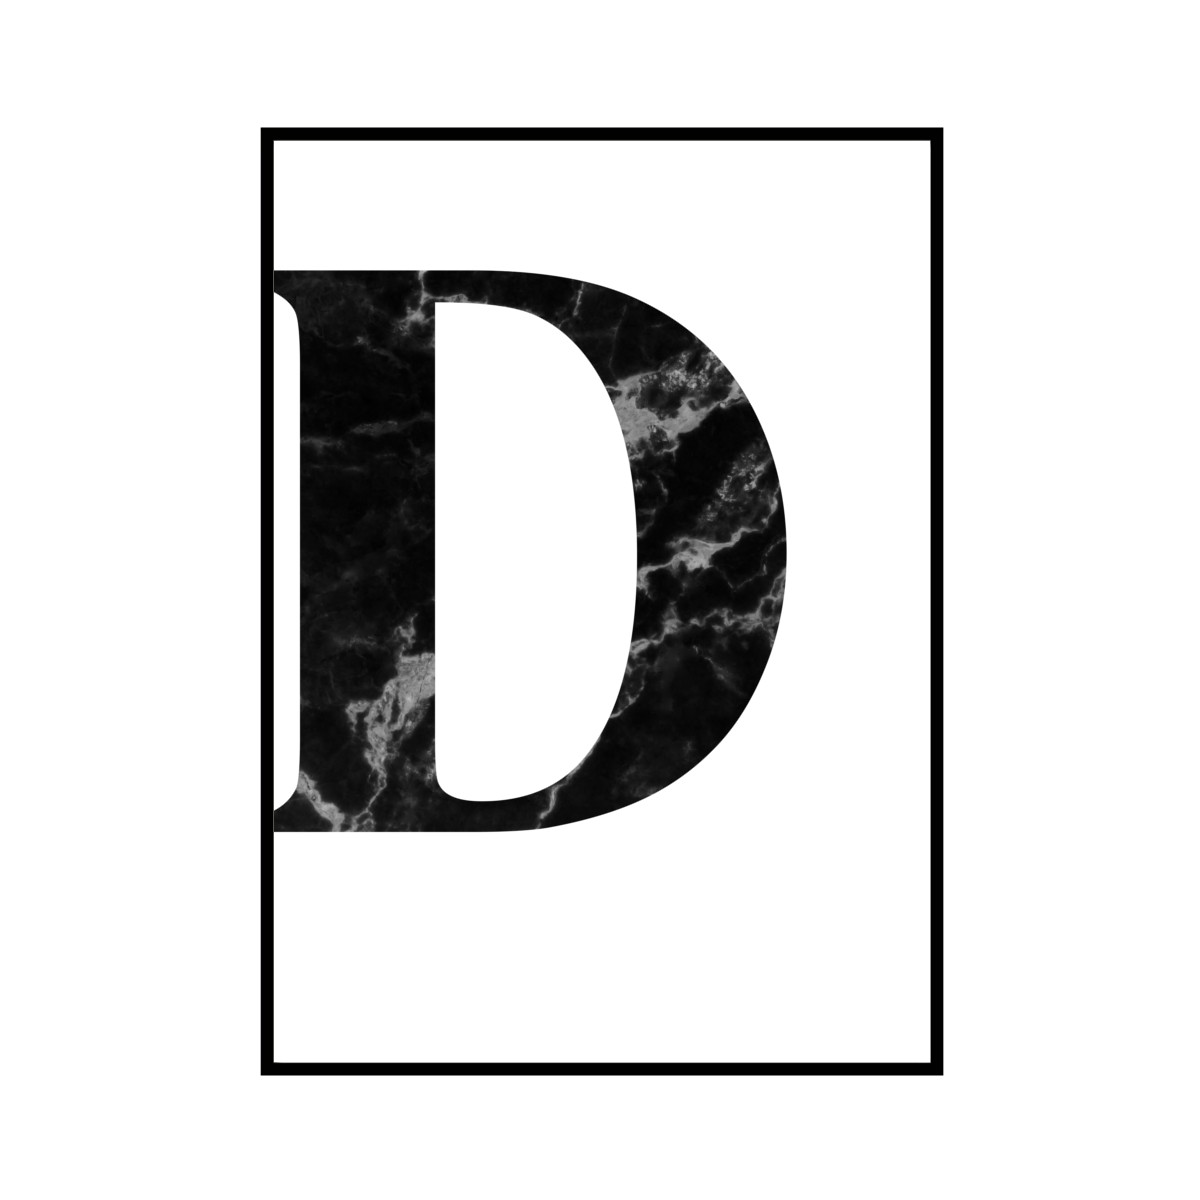 """D"" 黒大理石 - Black marble - ALPHAシリーズ [SD-000505] B4サイズ フレームセット"